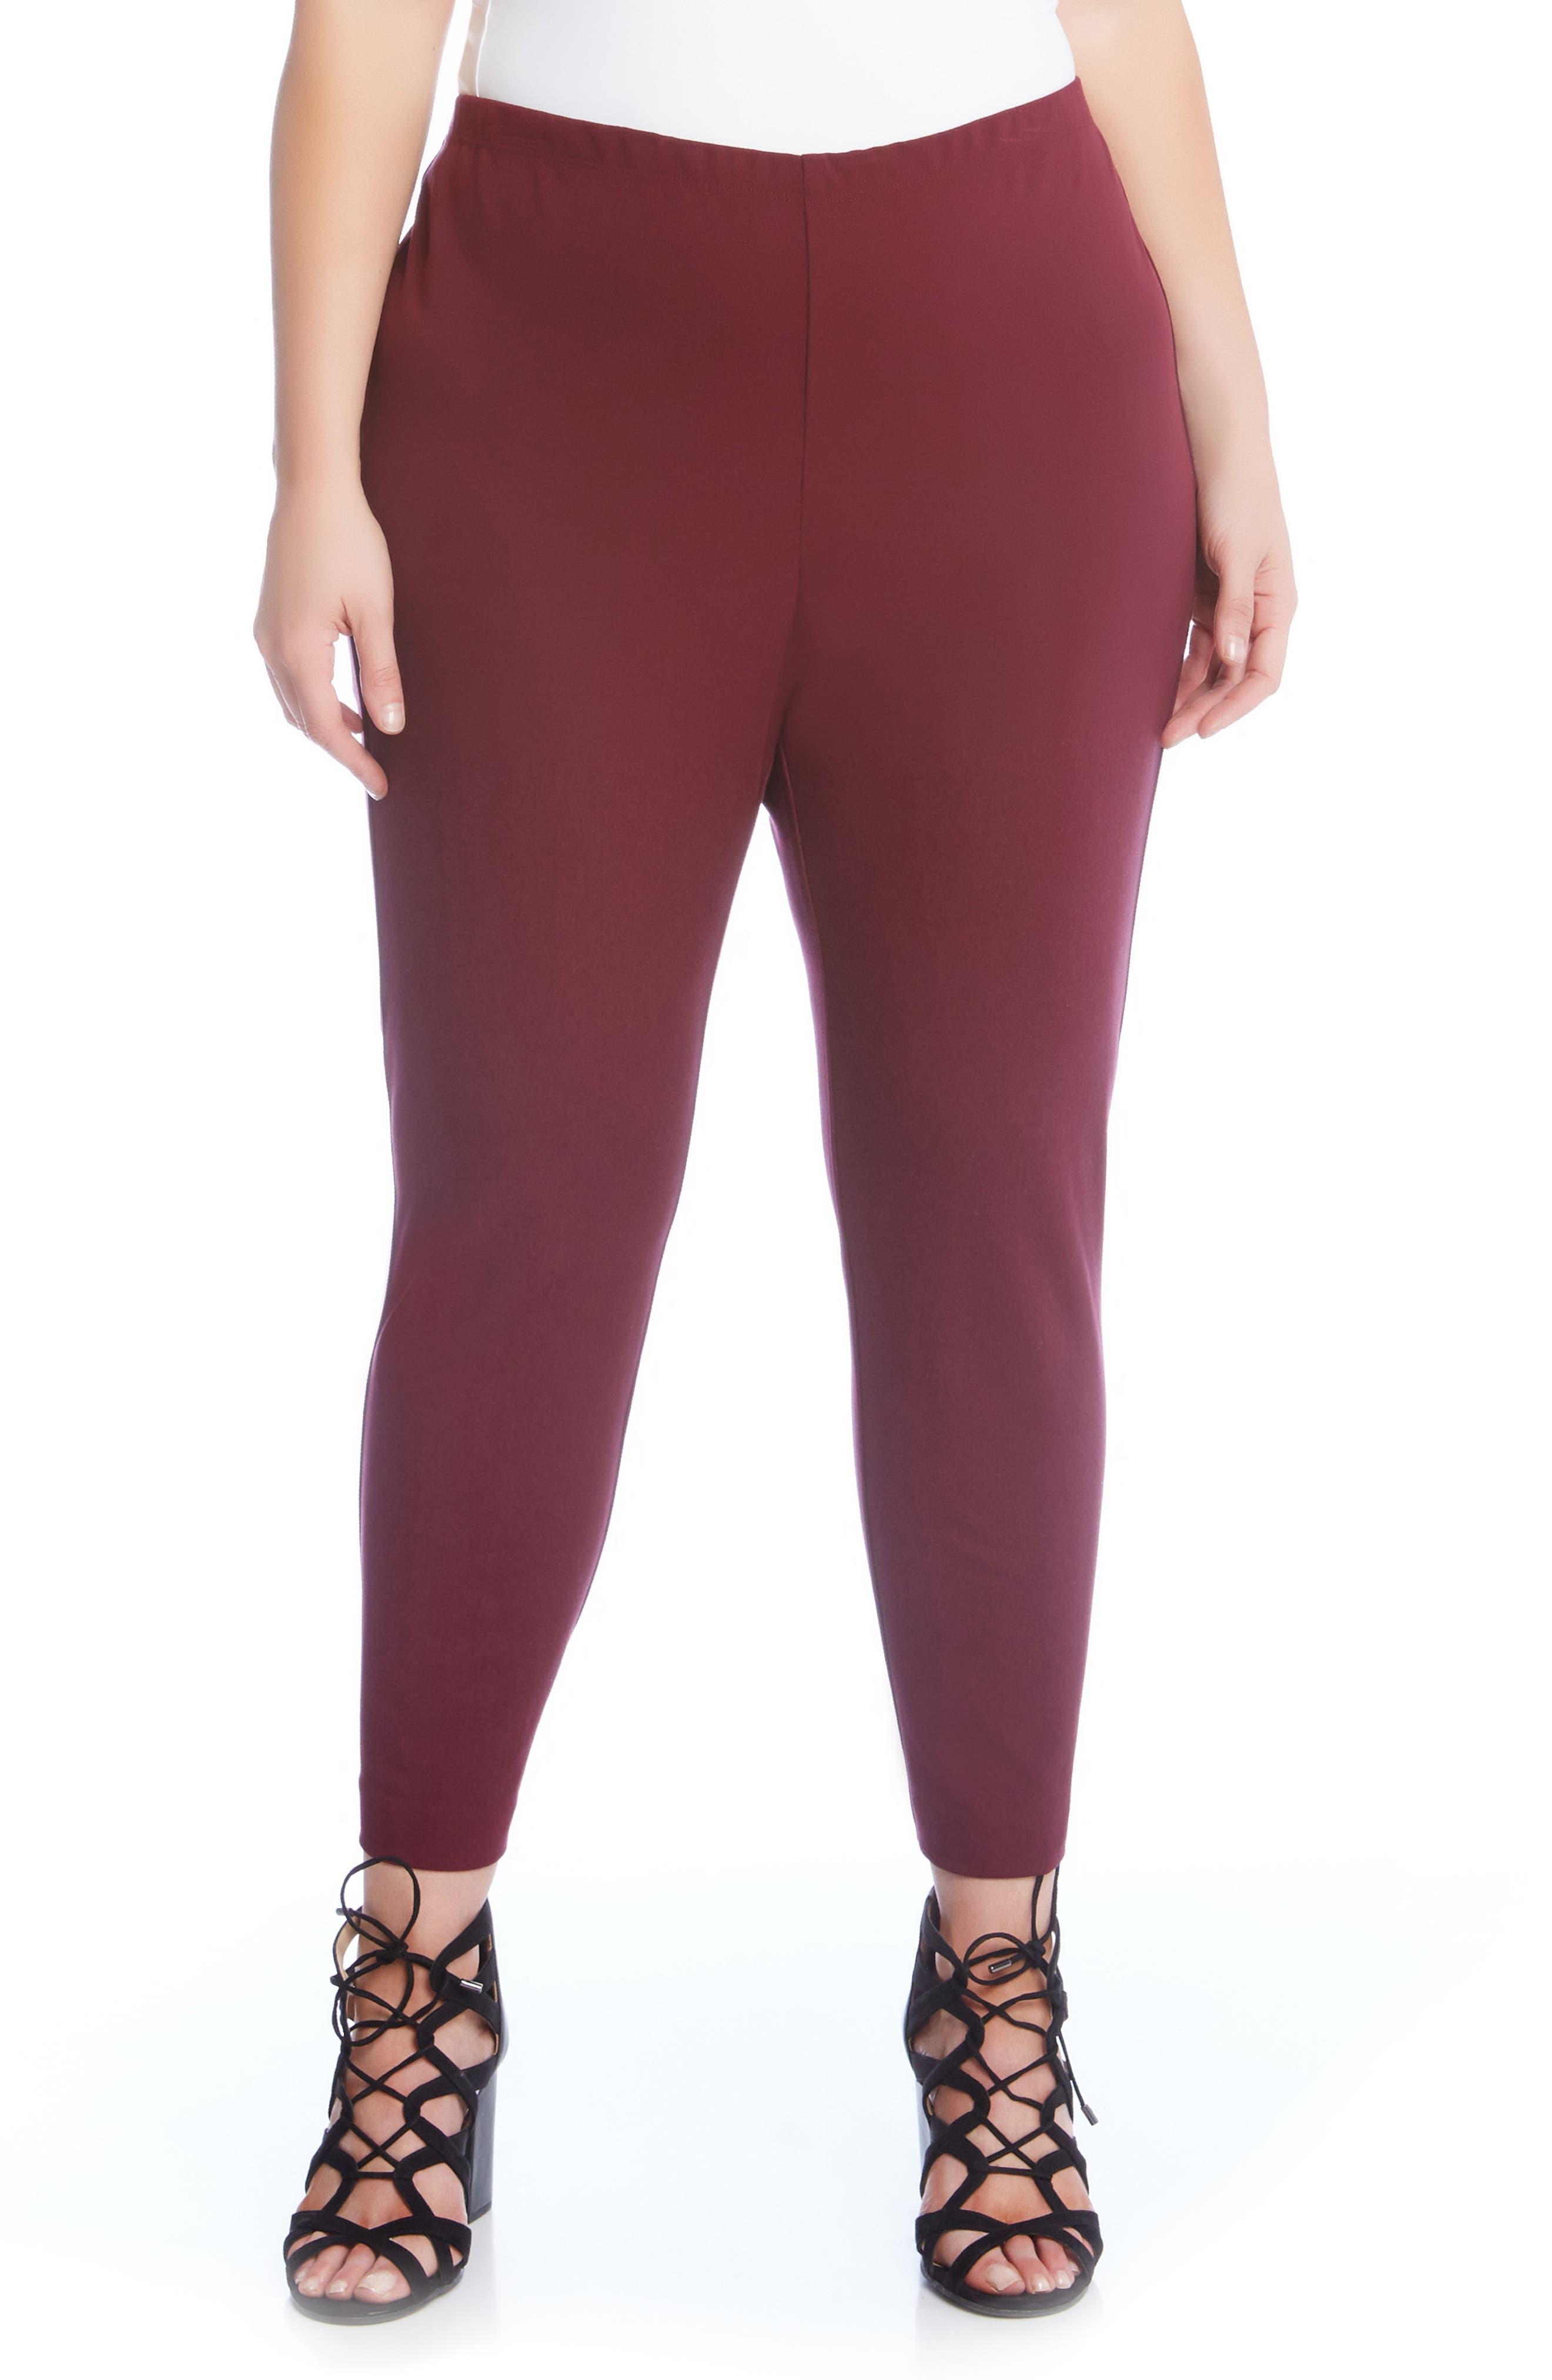 Piper High-Waist Pants,                         Main,                         color, 931